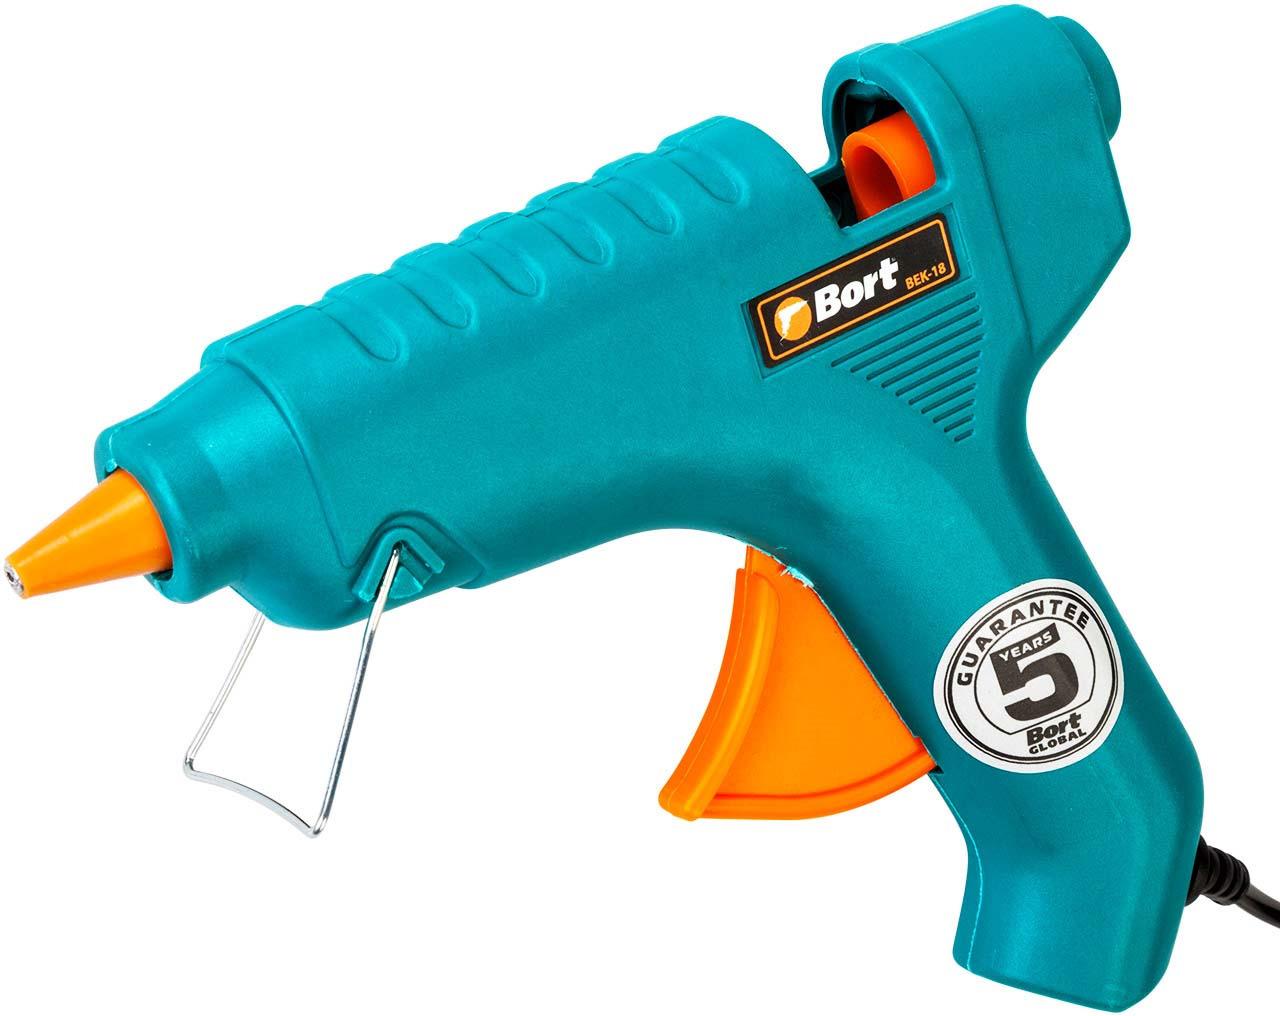 Пистолет клеевой Bort BEK-18, 91275967 цена и фото